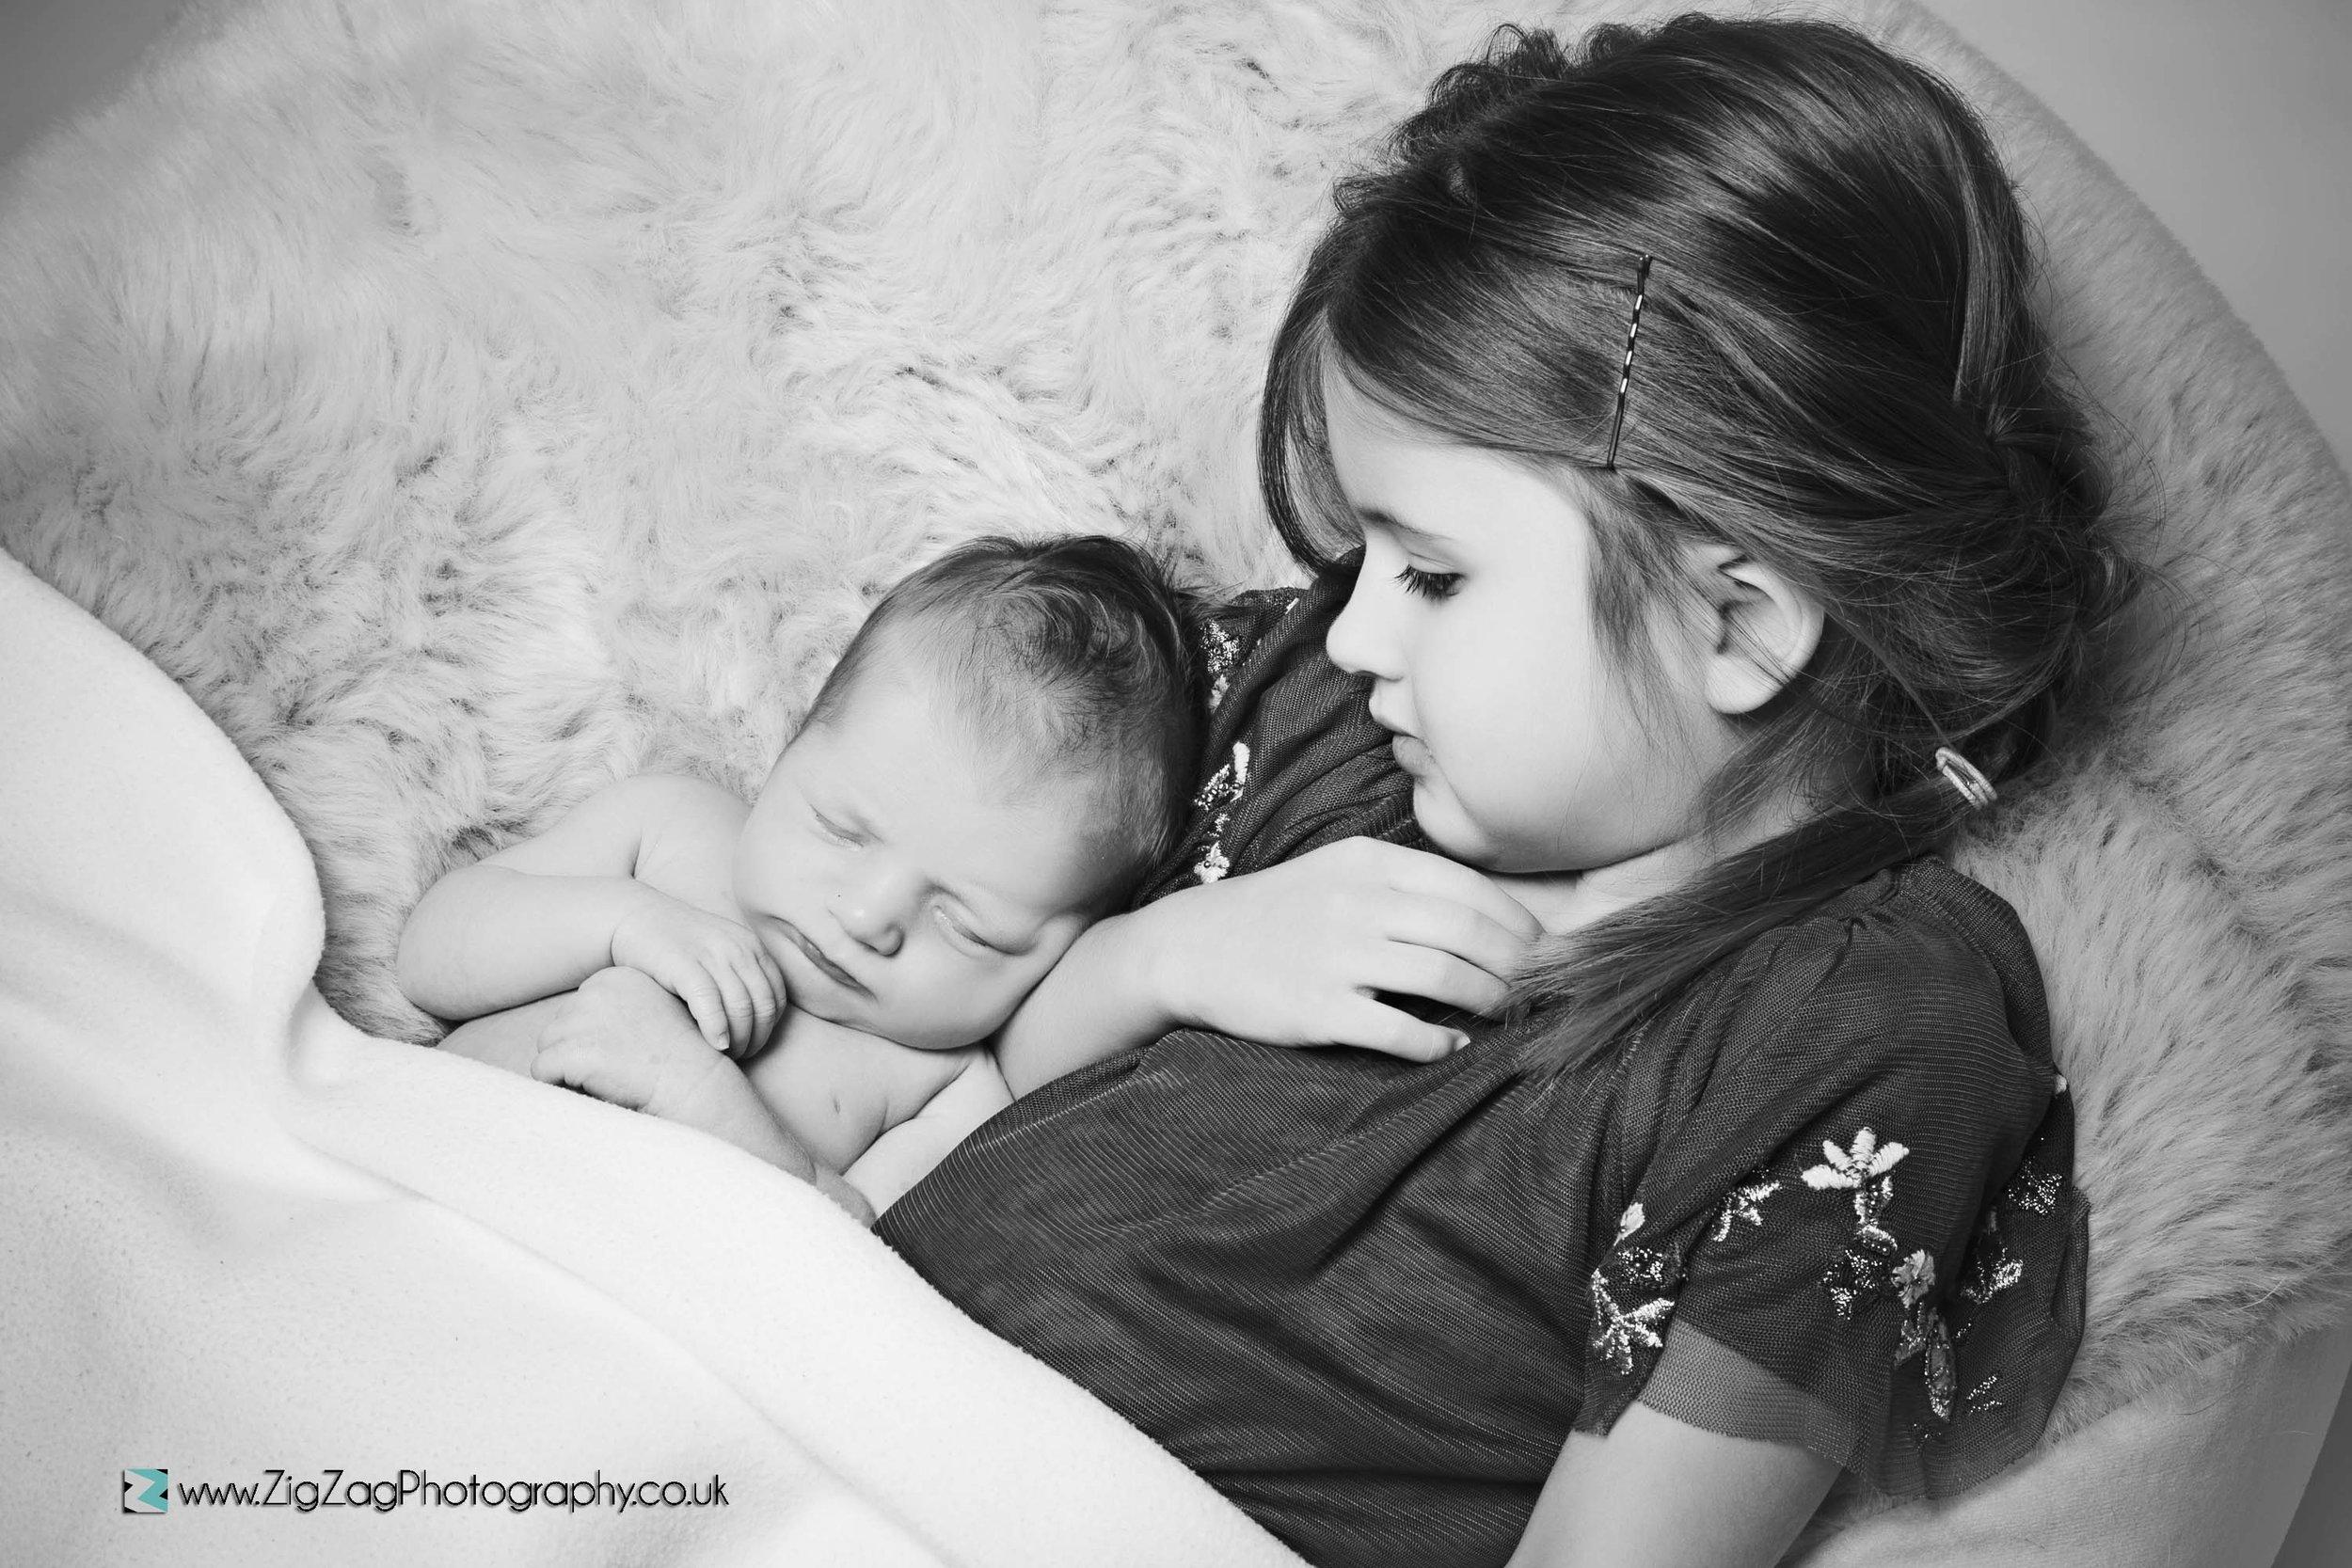 newborn-photography-photoshoot-leicester-studio-sibling-baby-black-white-sister-sleeping.jpg